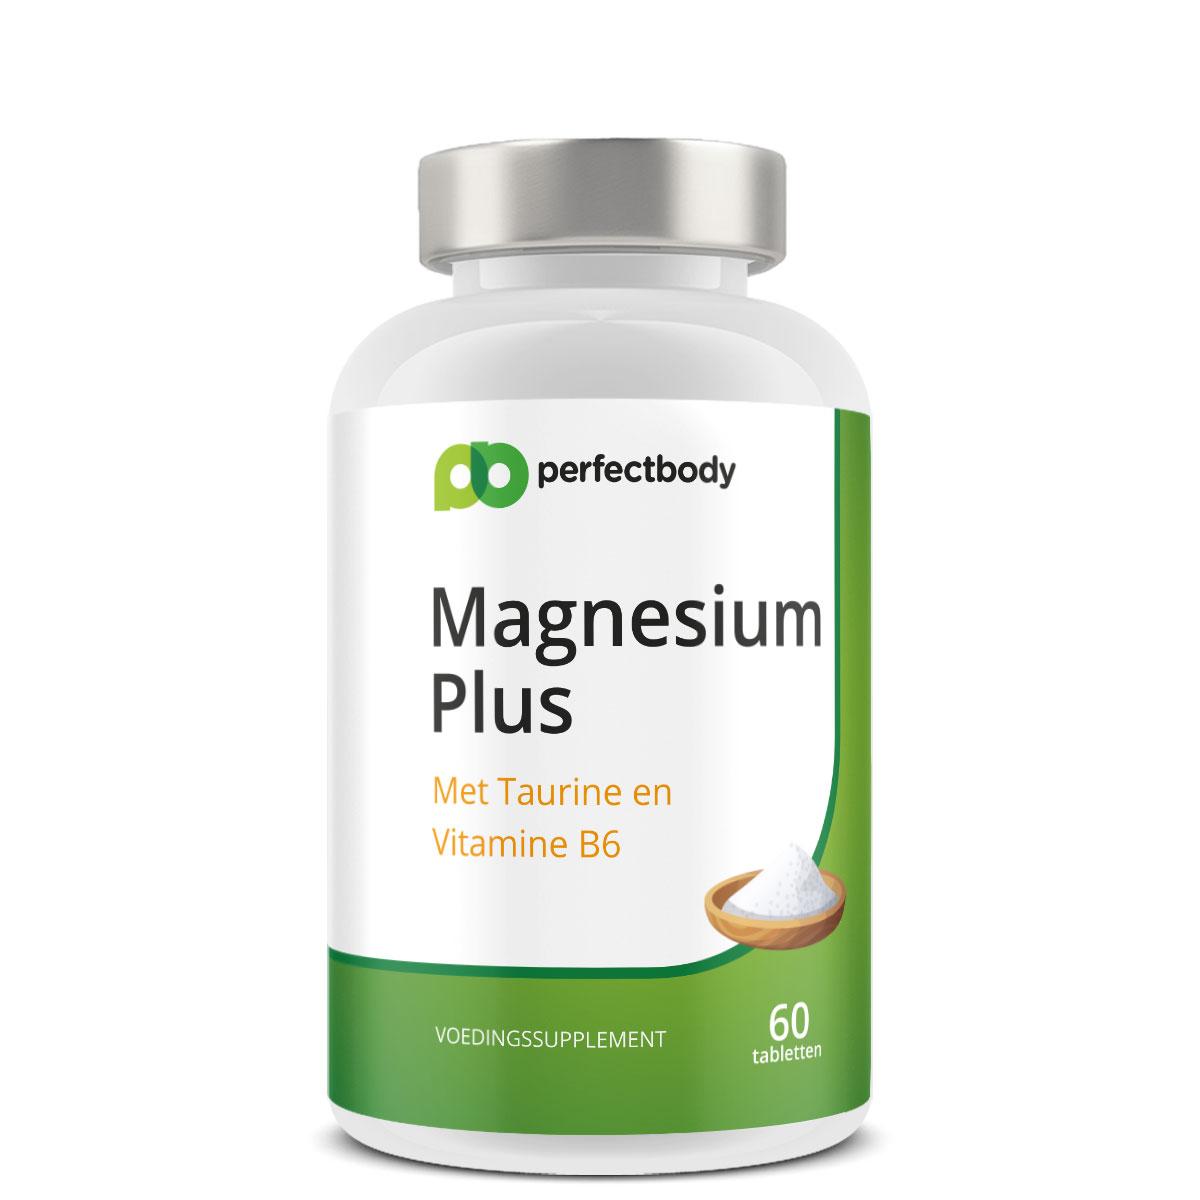 Perfectbody Magnesium Tabletten - 60 Tabletten